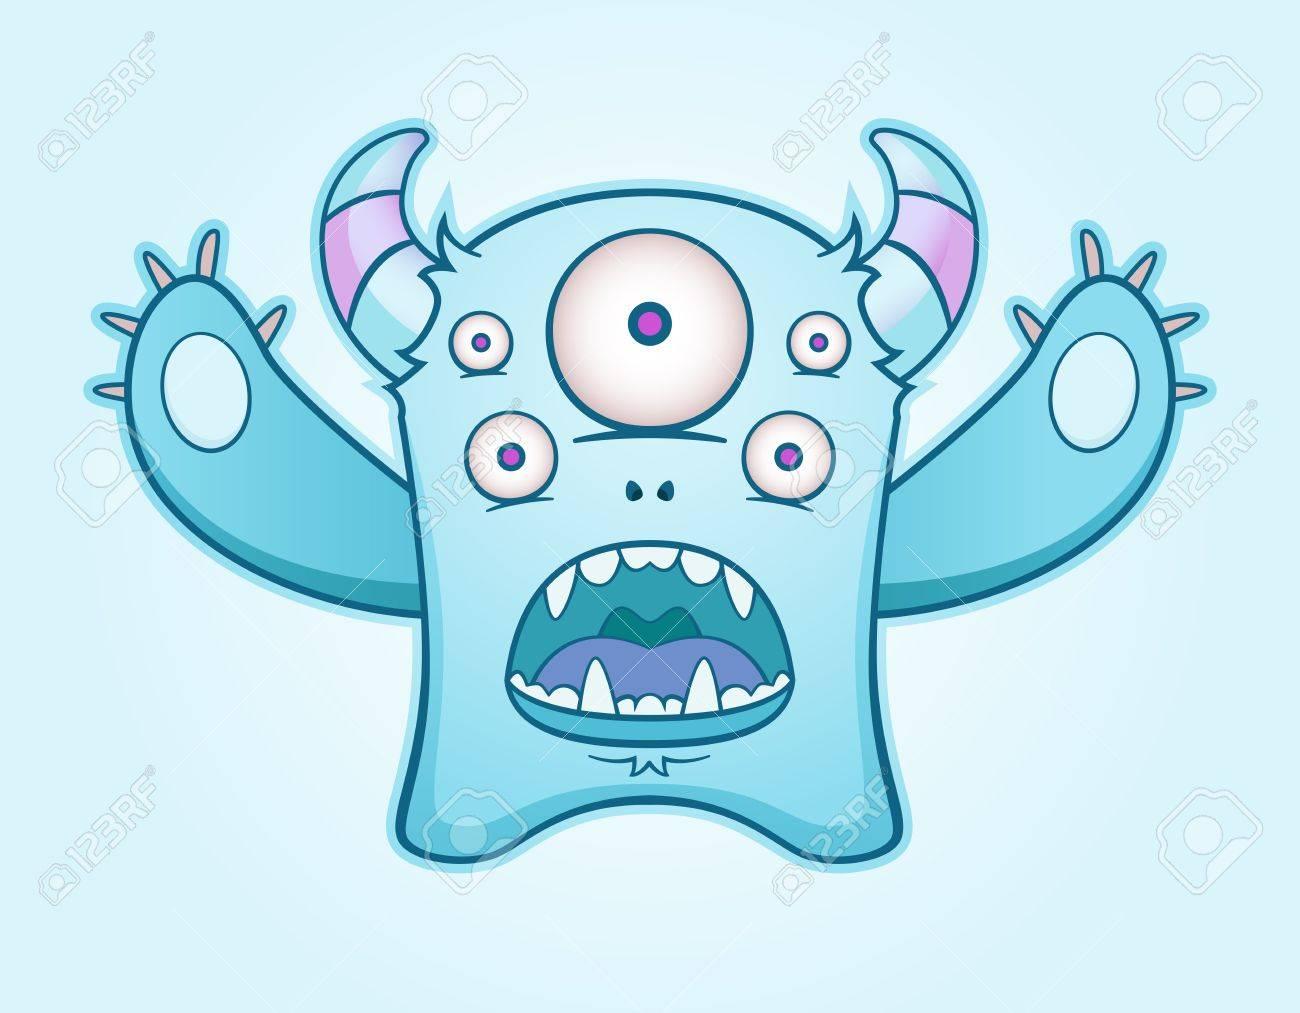 Surprised Blue Monster - 10498767